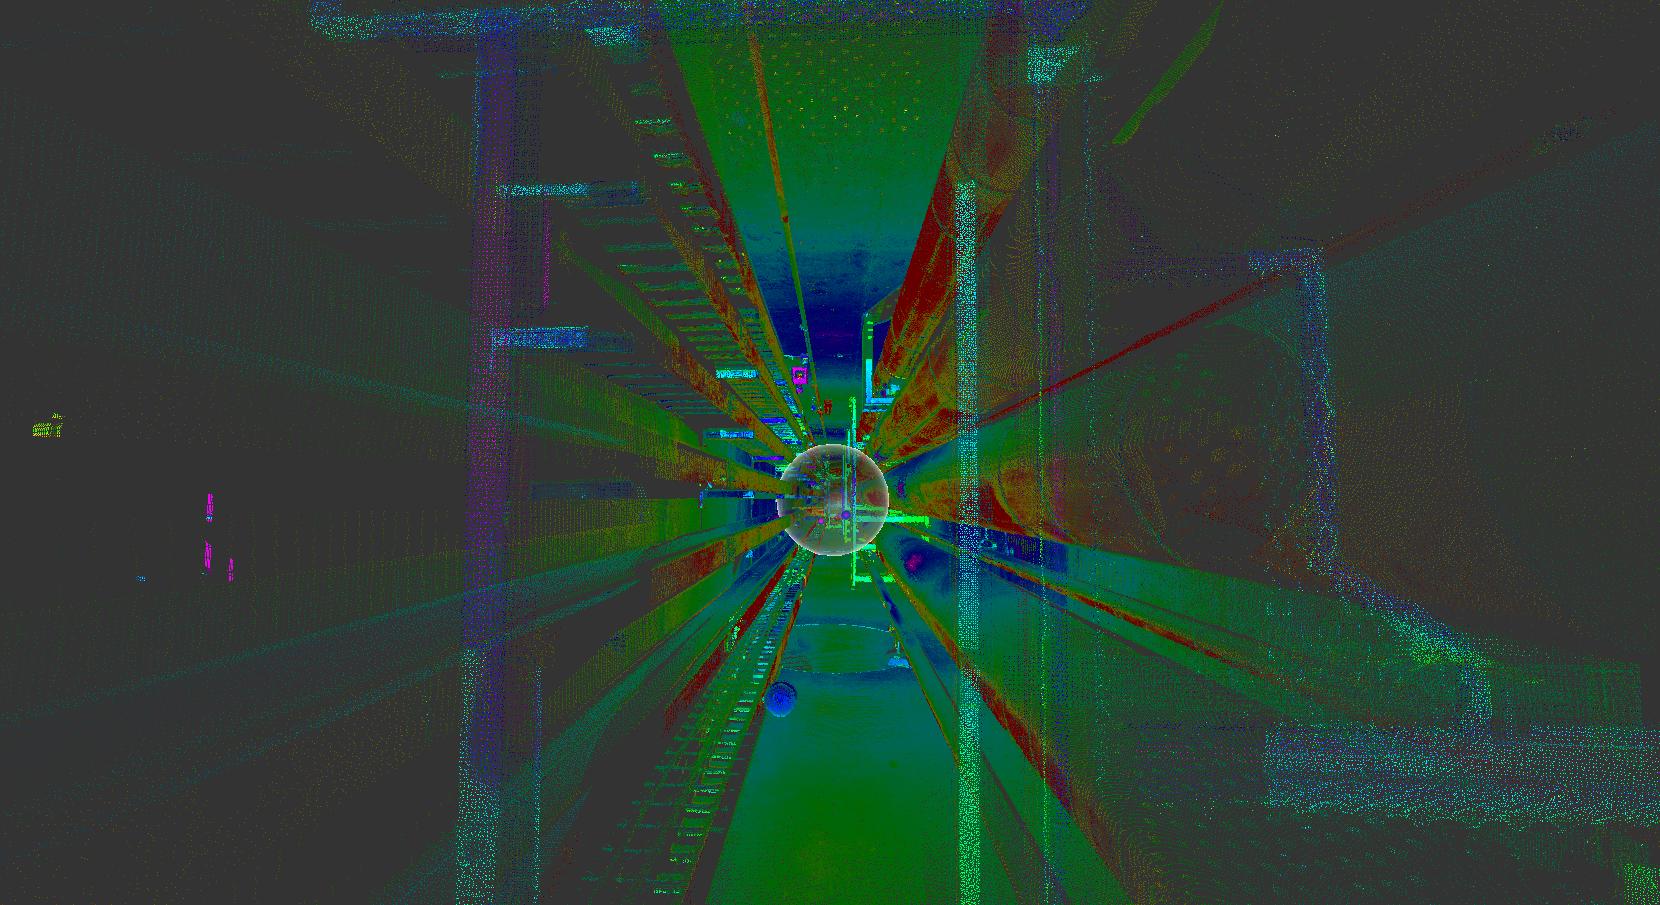 Faro laser scan in Autodesk ReCap